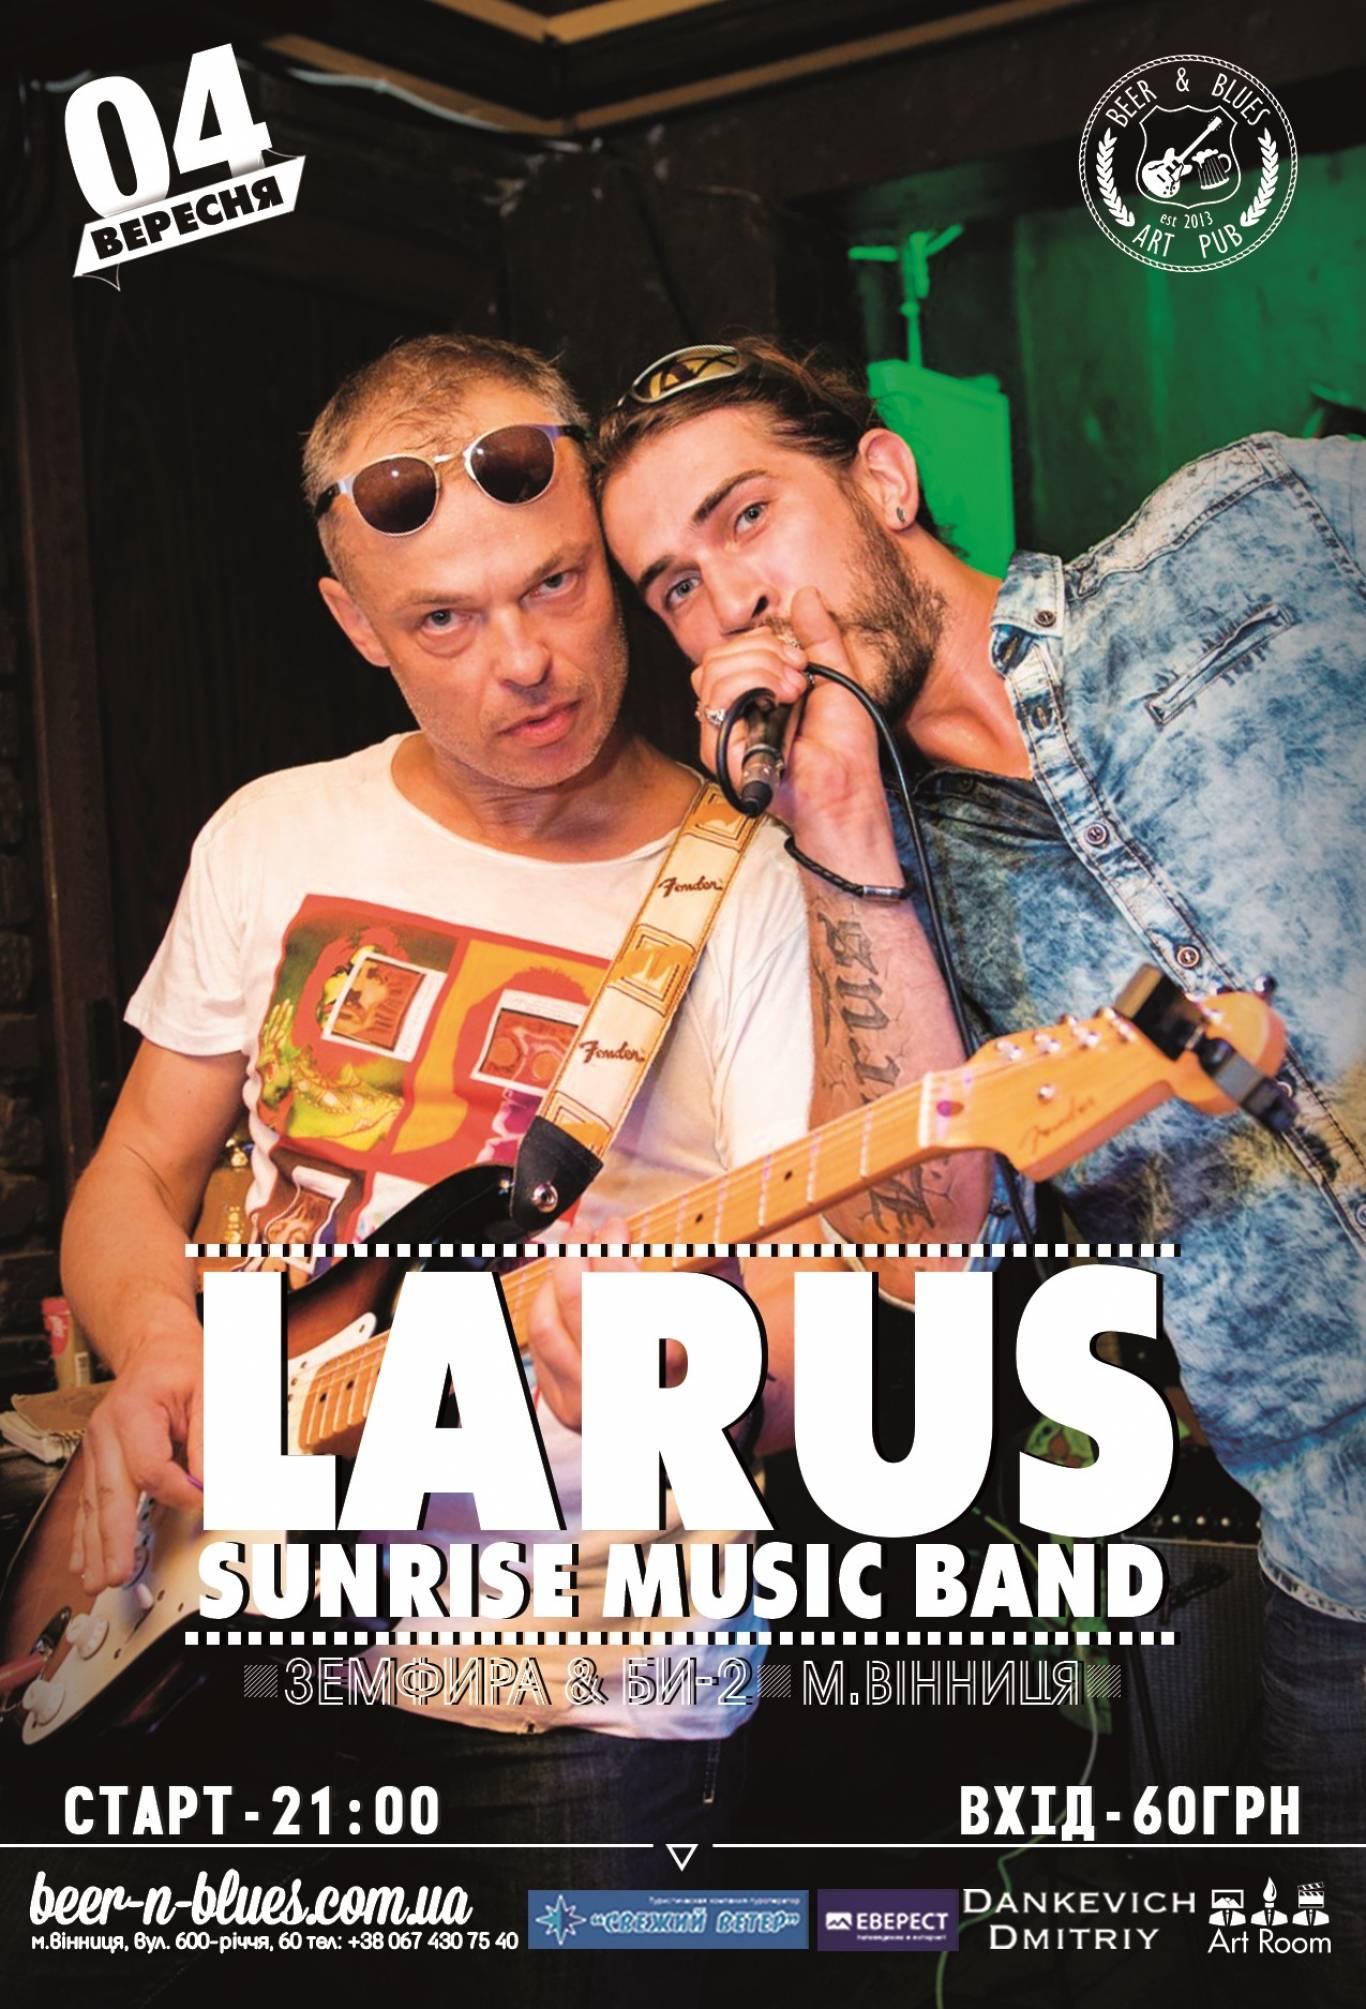 Музичний вечір разом з Sunrise music band» &«LARUS